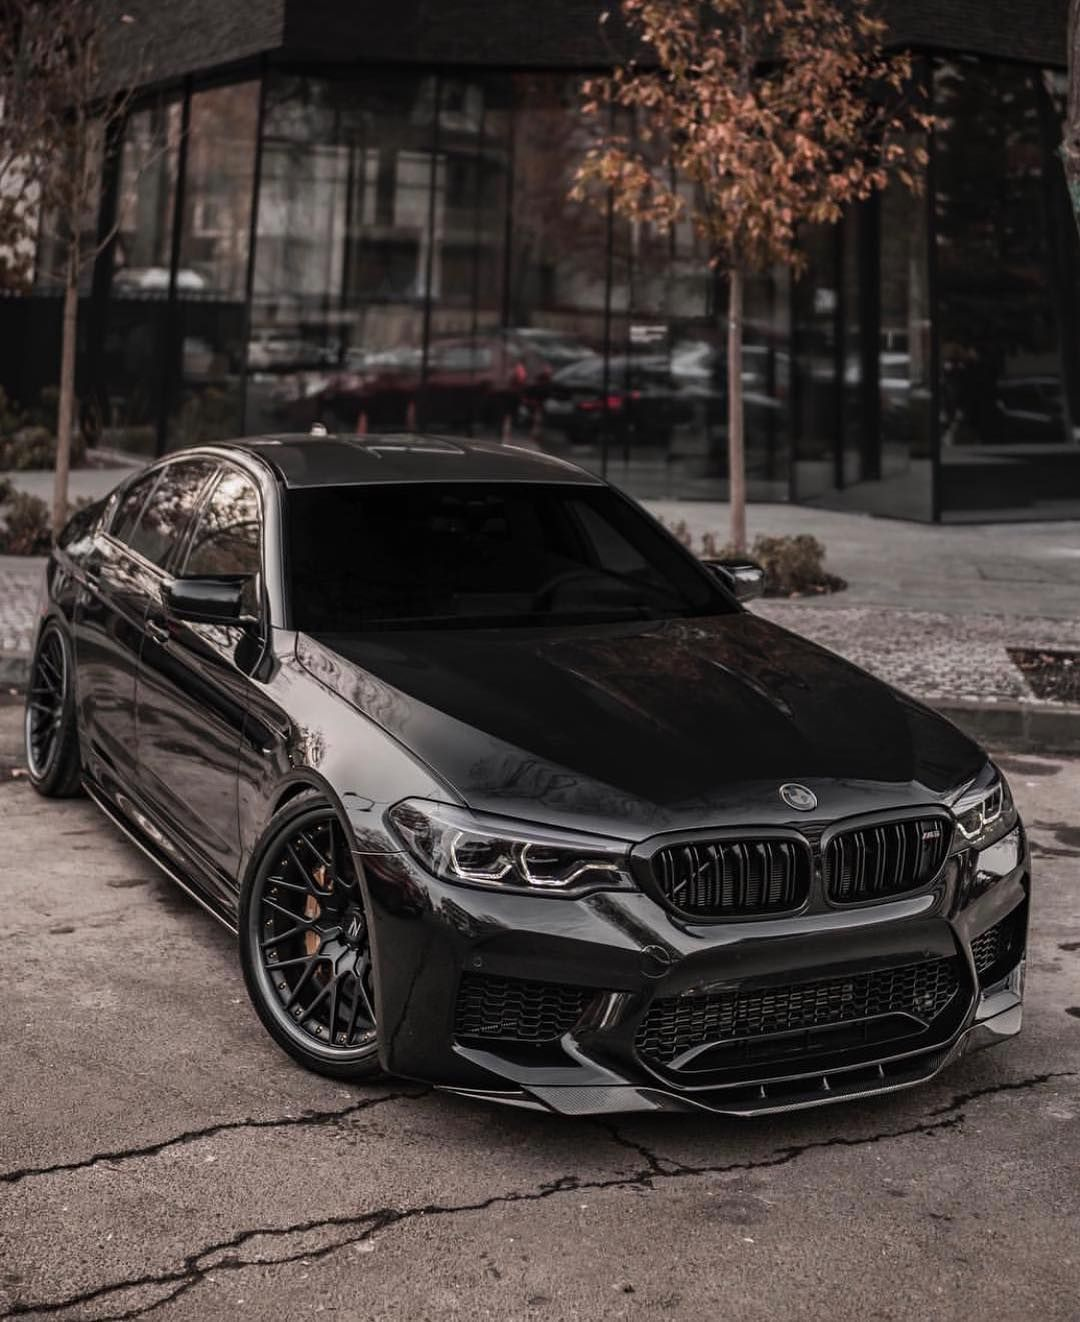 Bmw M5 Sport: BMW F90 M5 Black (With Images)